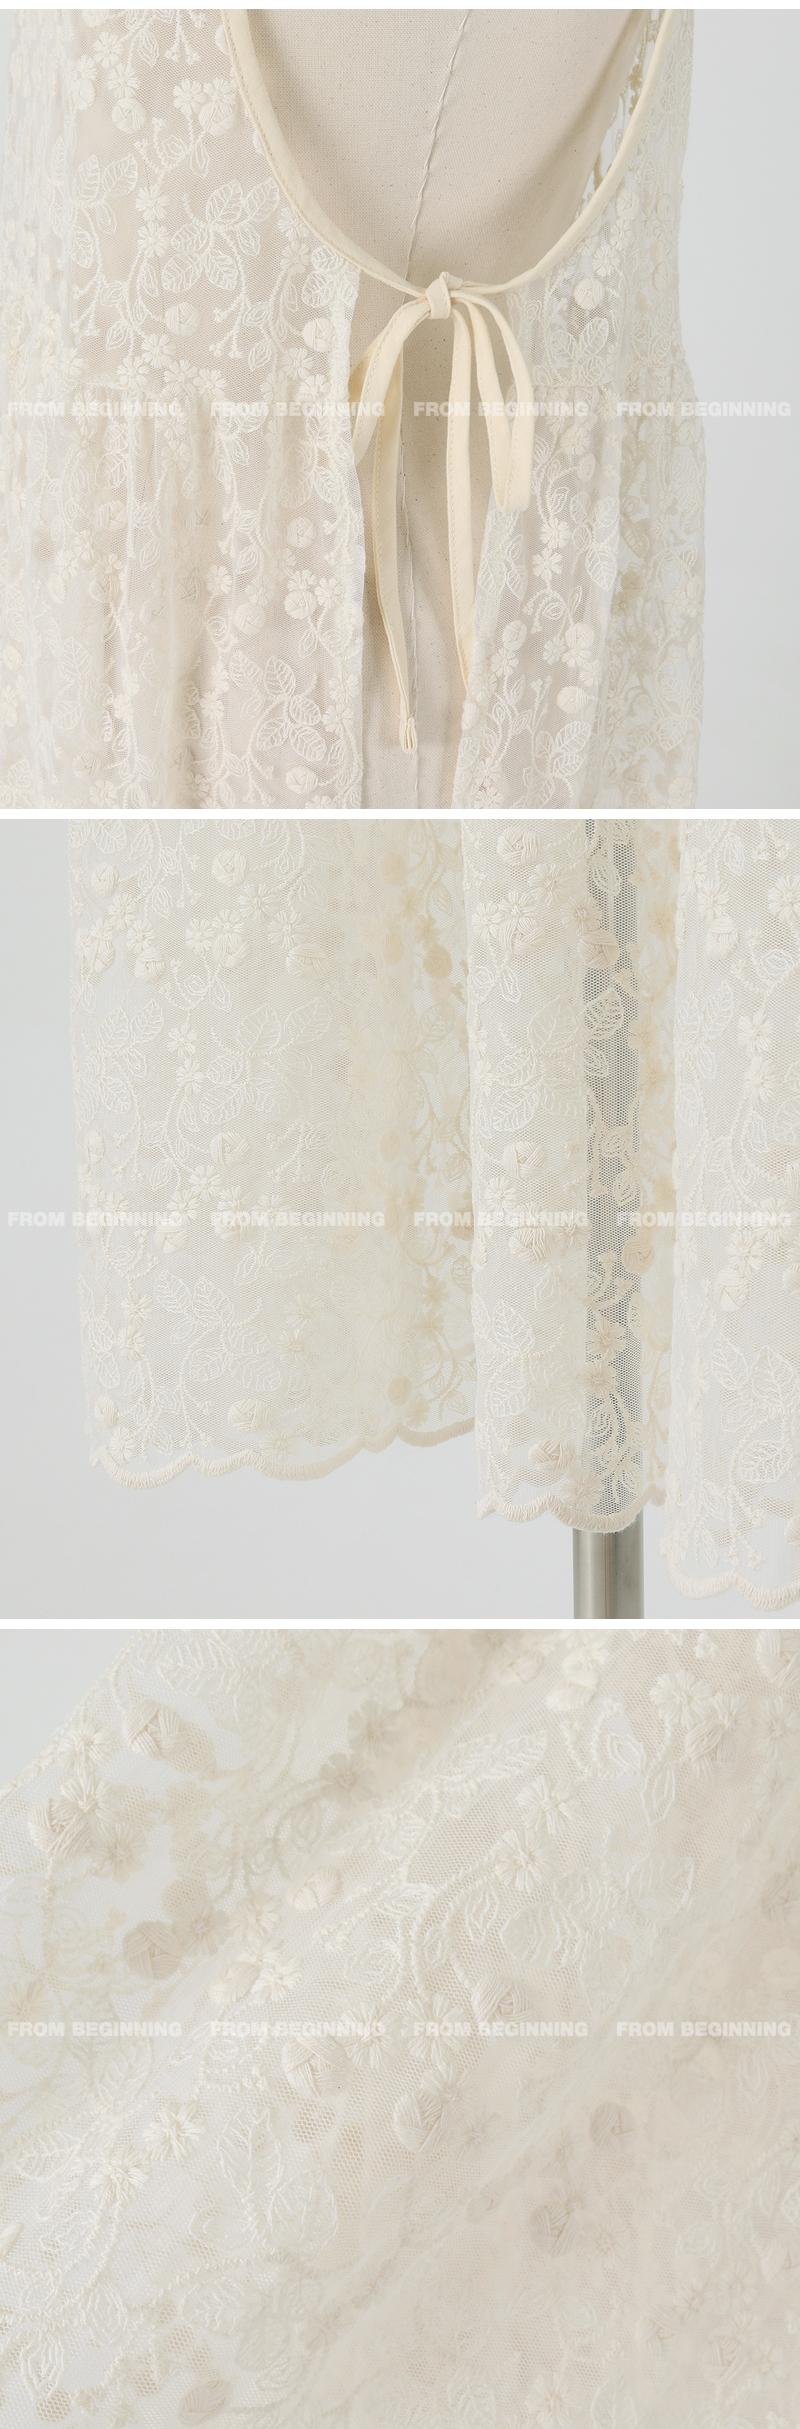 Layered lace bustier Dress